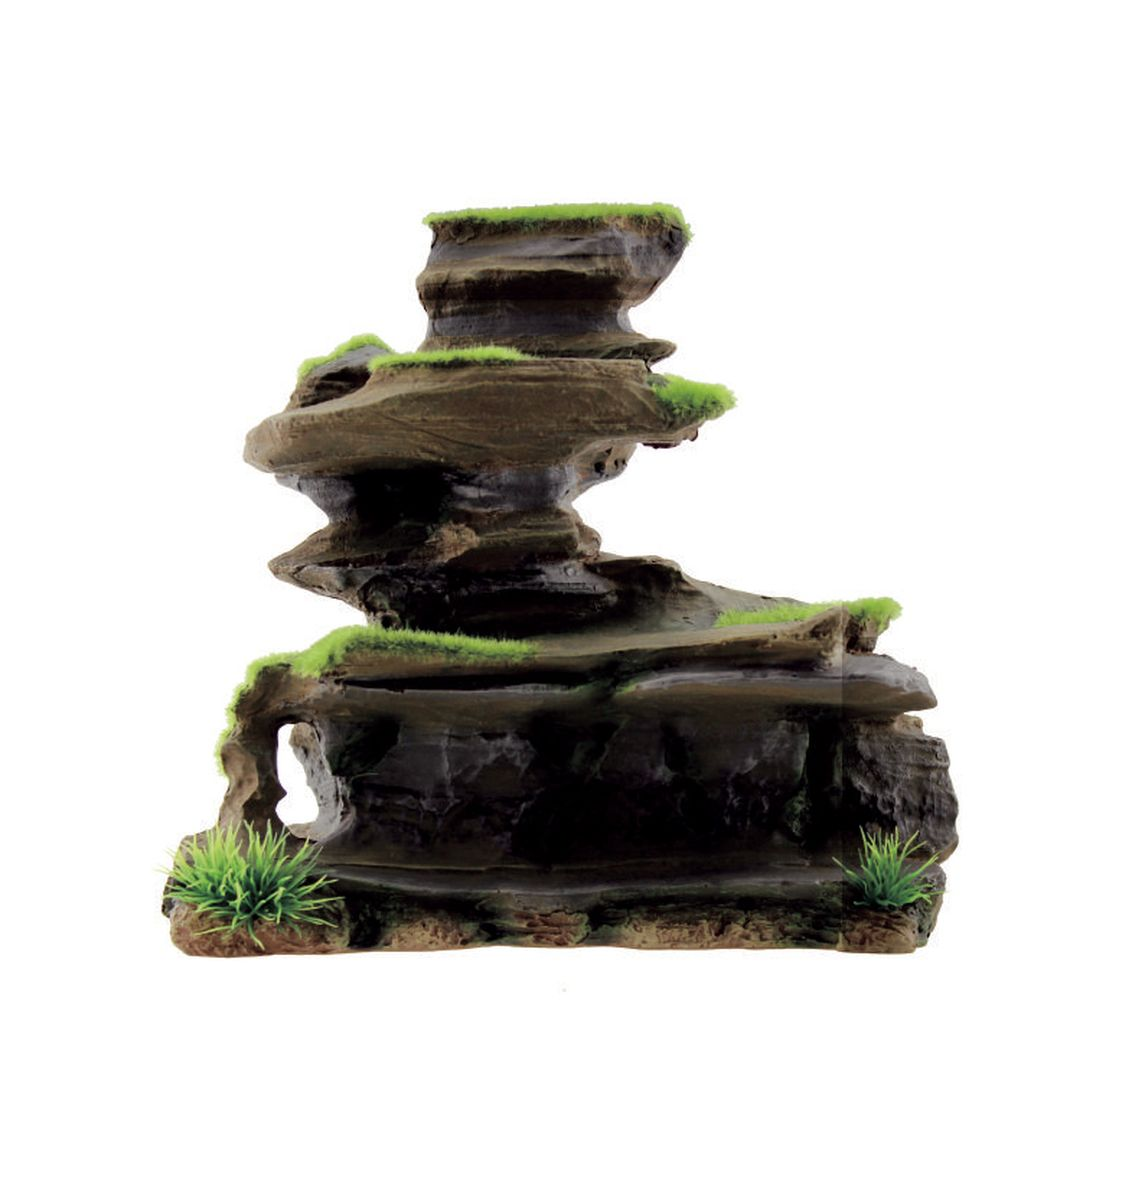 Декорация для аквариума ArtUniq Фигурная скала со мхом, 22,5 x 11,5 x 21,5 см0120710Декорация для аквариума ArtUniq Фигурная скала со мхом, 22,5 x 11,5 x 21,5 см